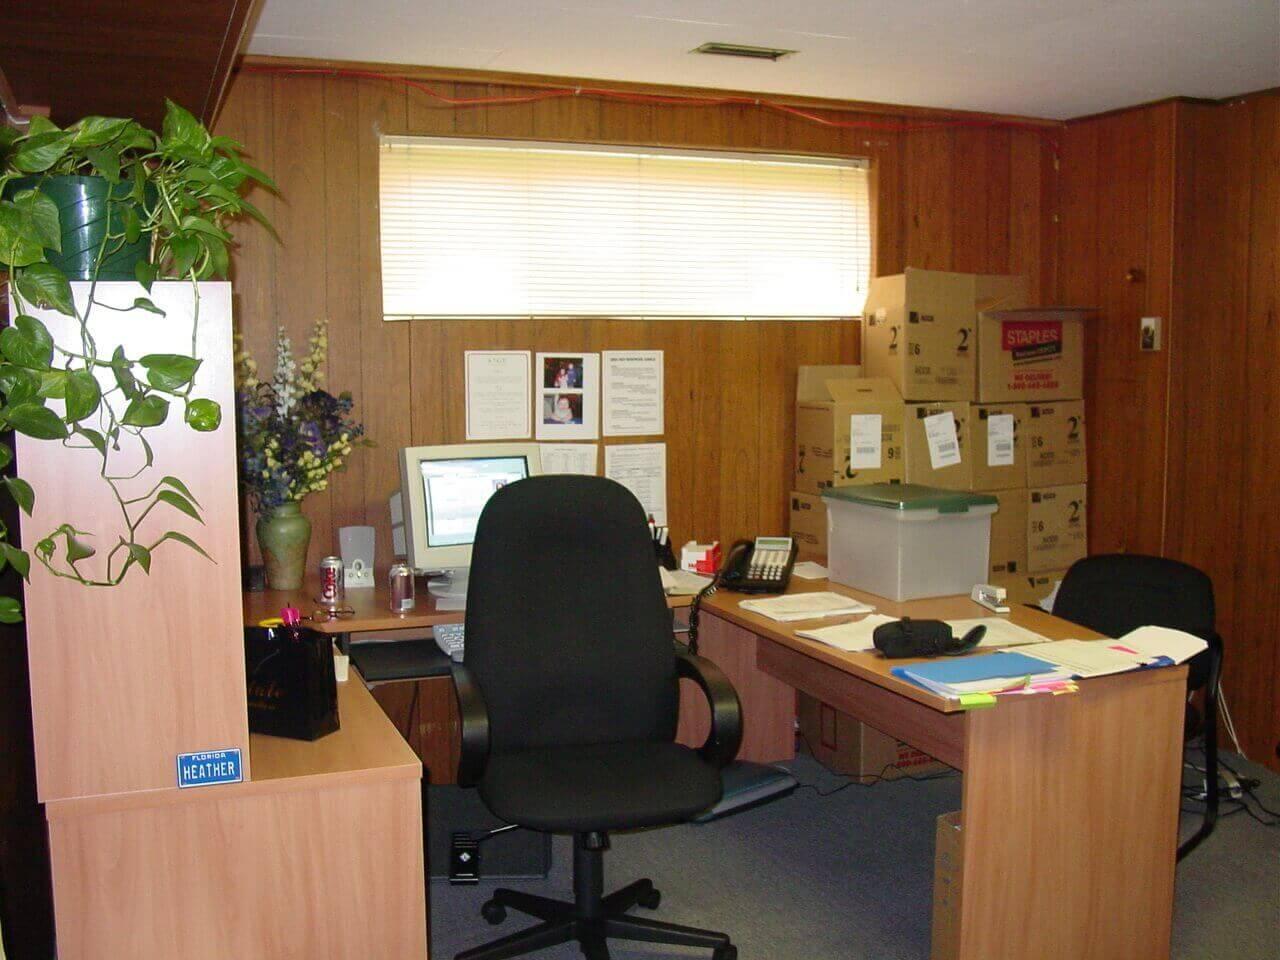 New Office Desks 5